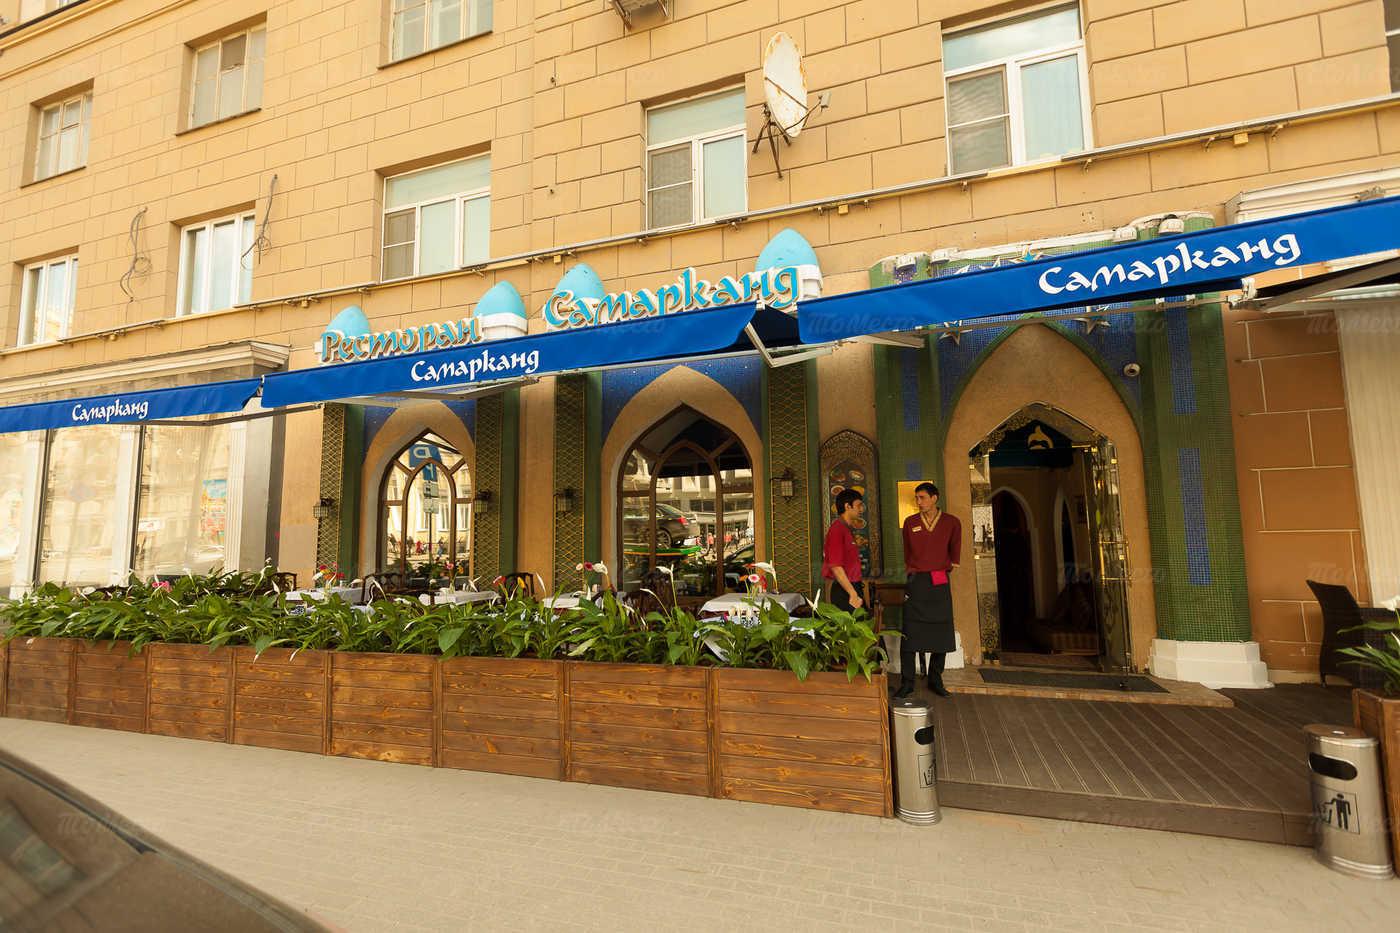 Меню ресторана Самарканд (Samarkand) на проспекте Мира